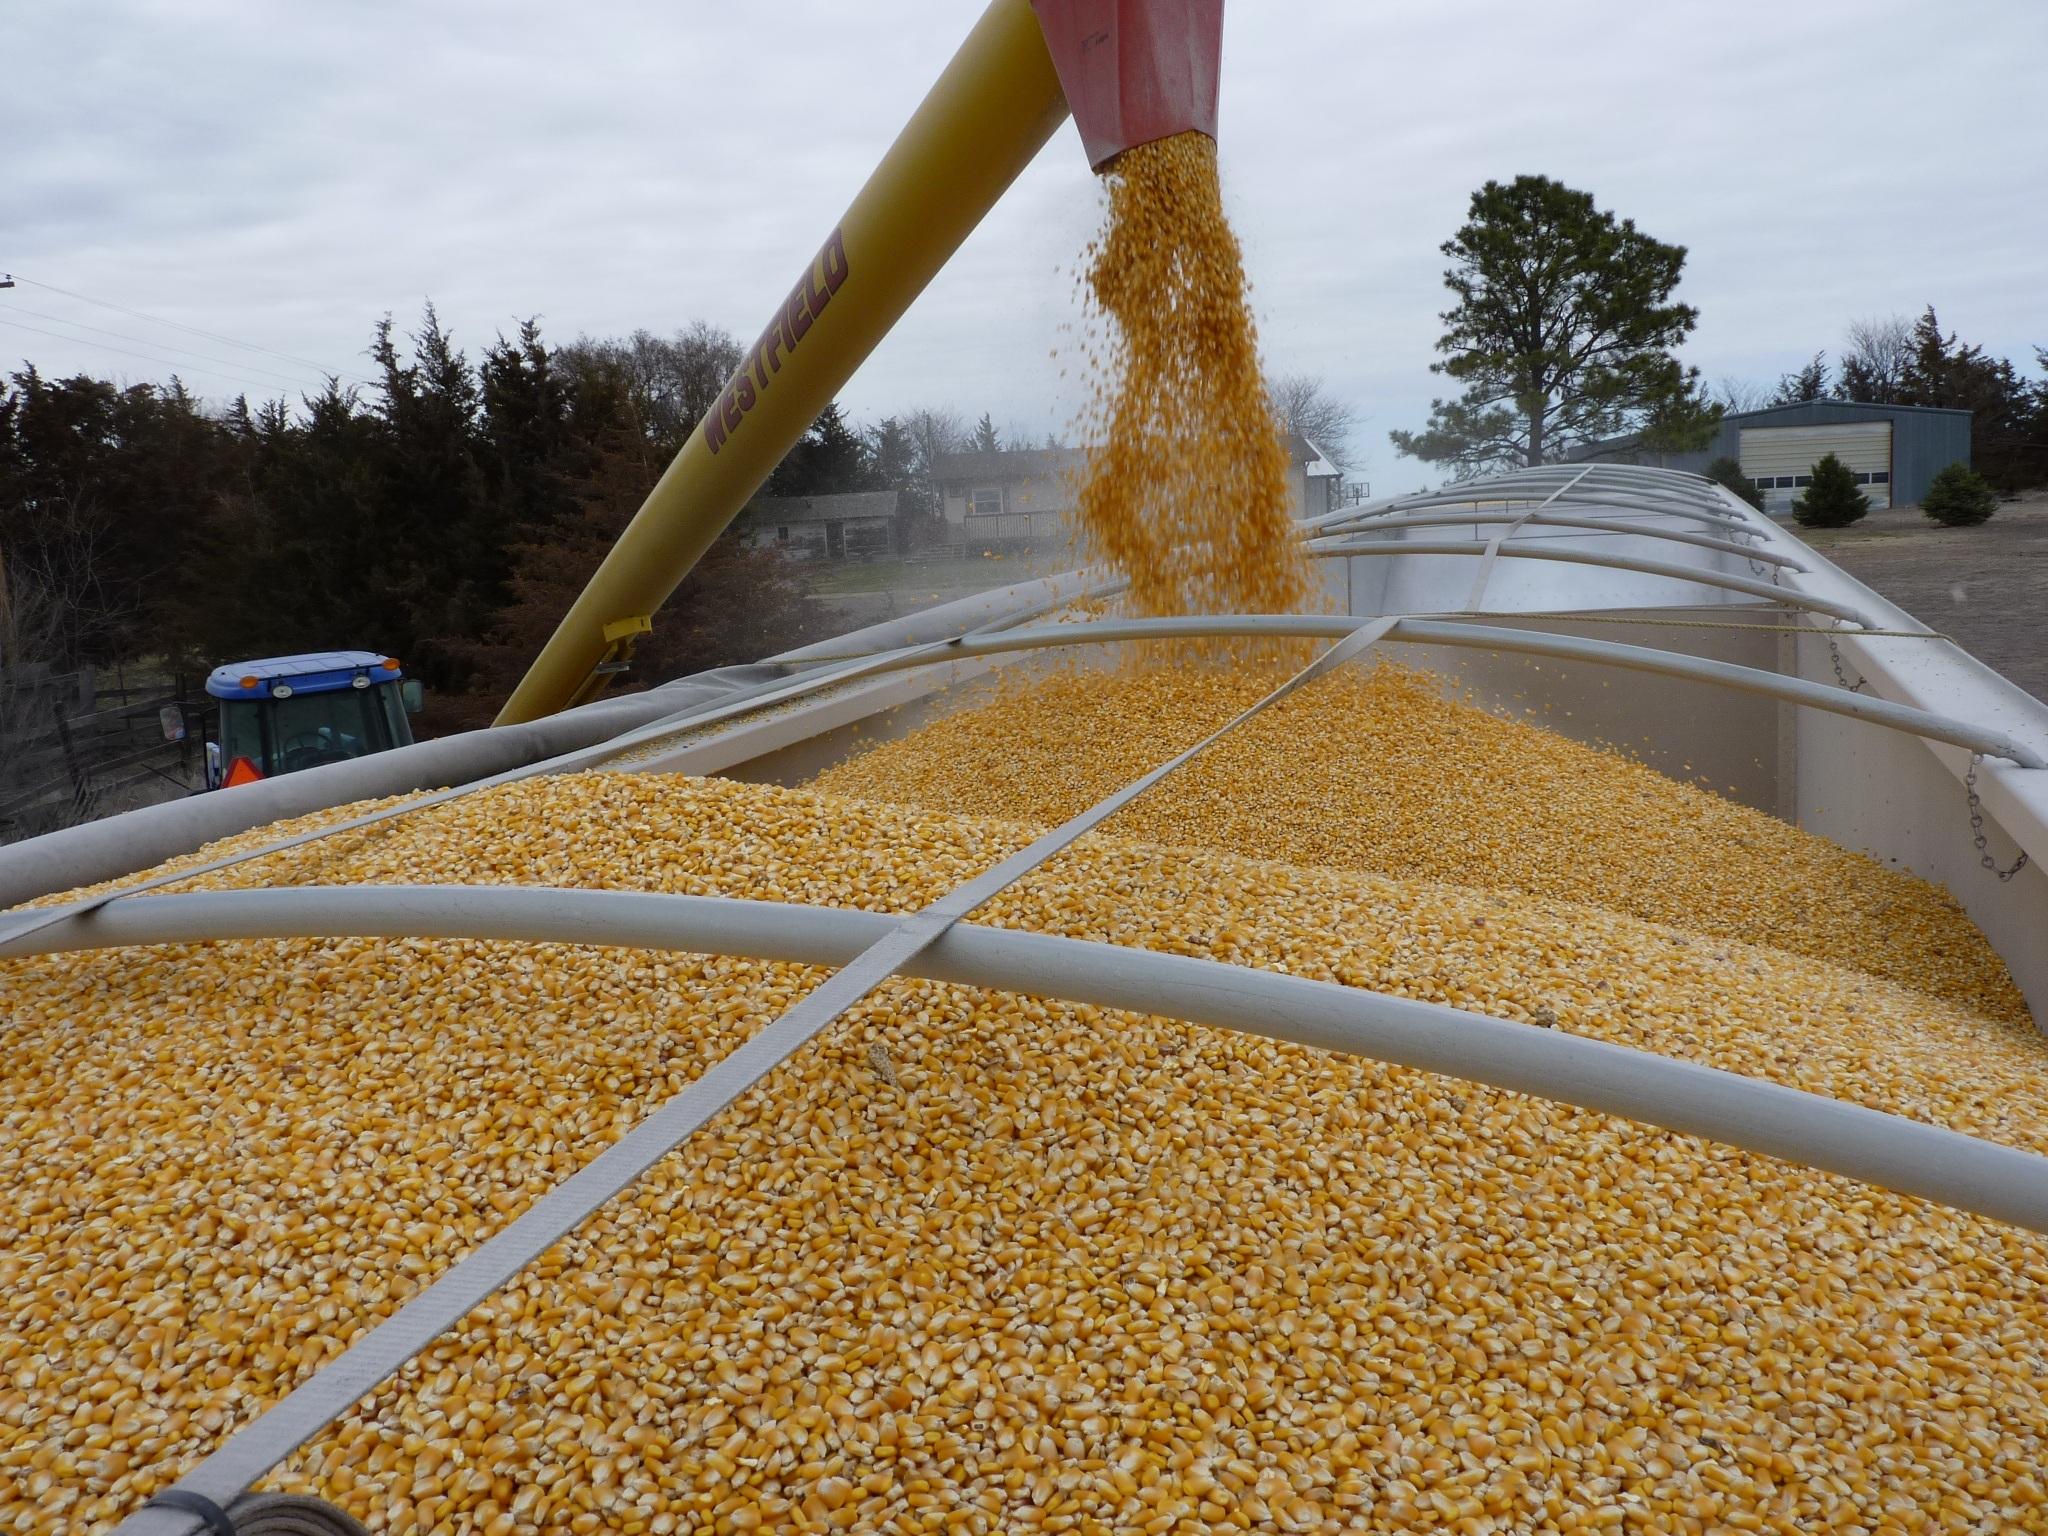 A blockchain trade a first ever in the grain trade   Ontario Farmer  1 February 2019